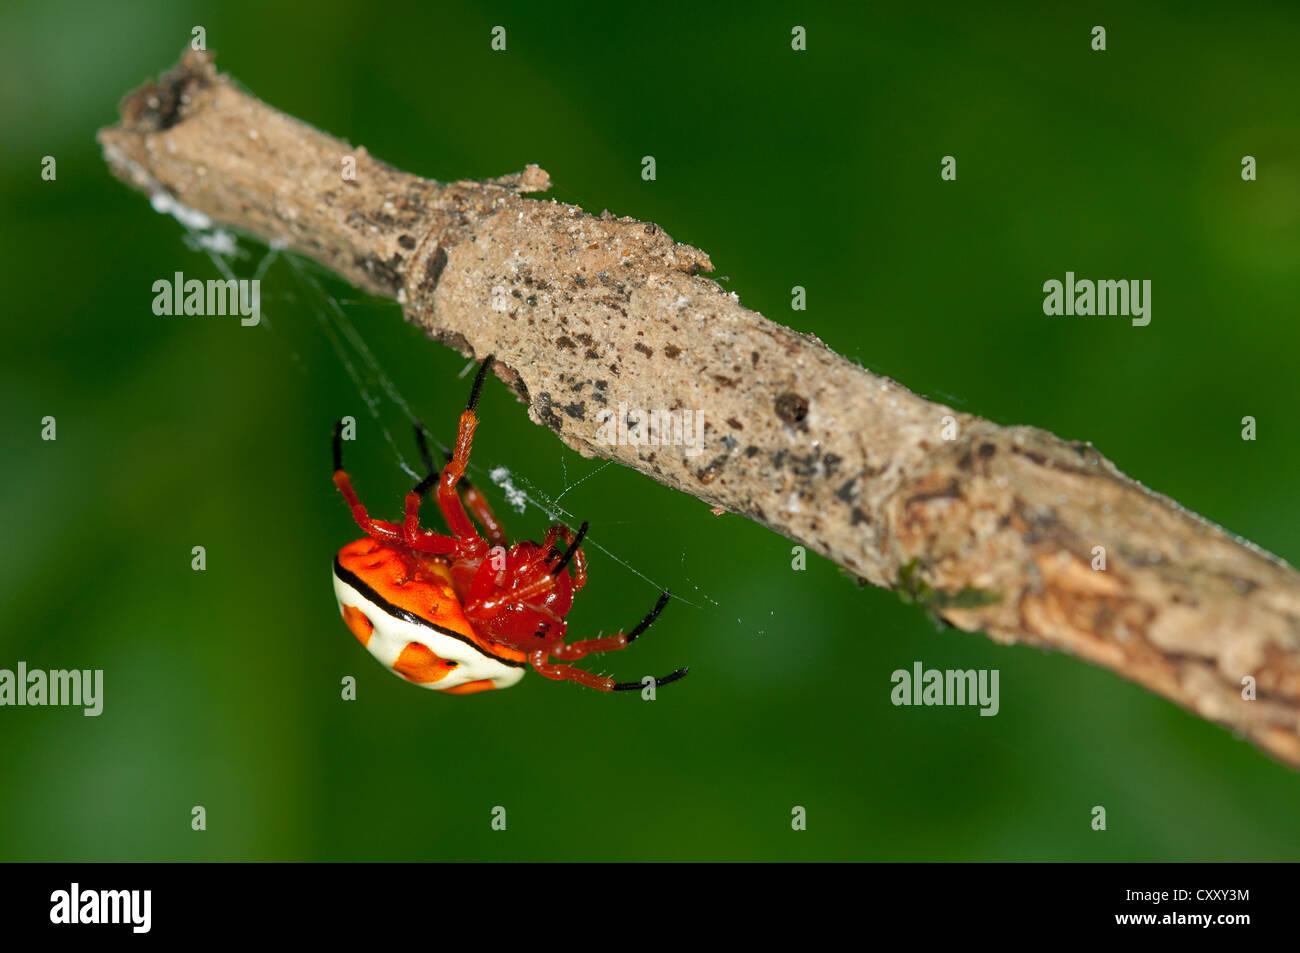 Bolas spider (Encyosaccus sexmaculatus), orb-web spider, Tiputini rain forest, Yasuni National Park, Ecuador, South - Stock Image